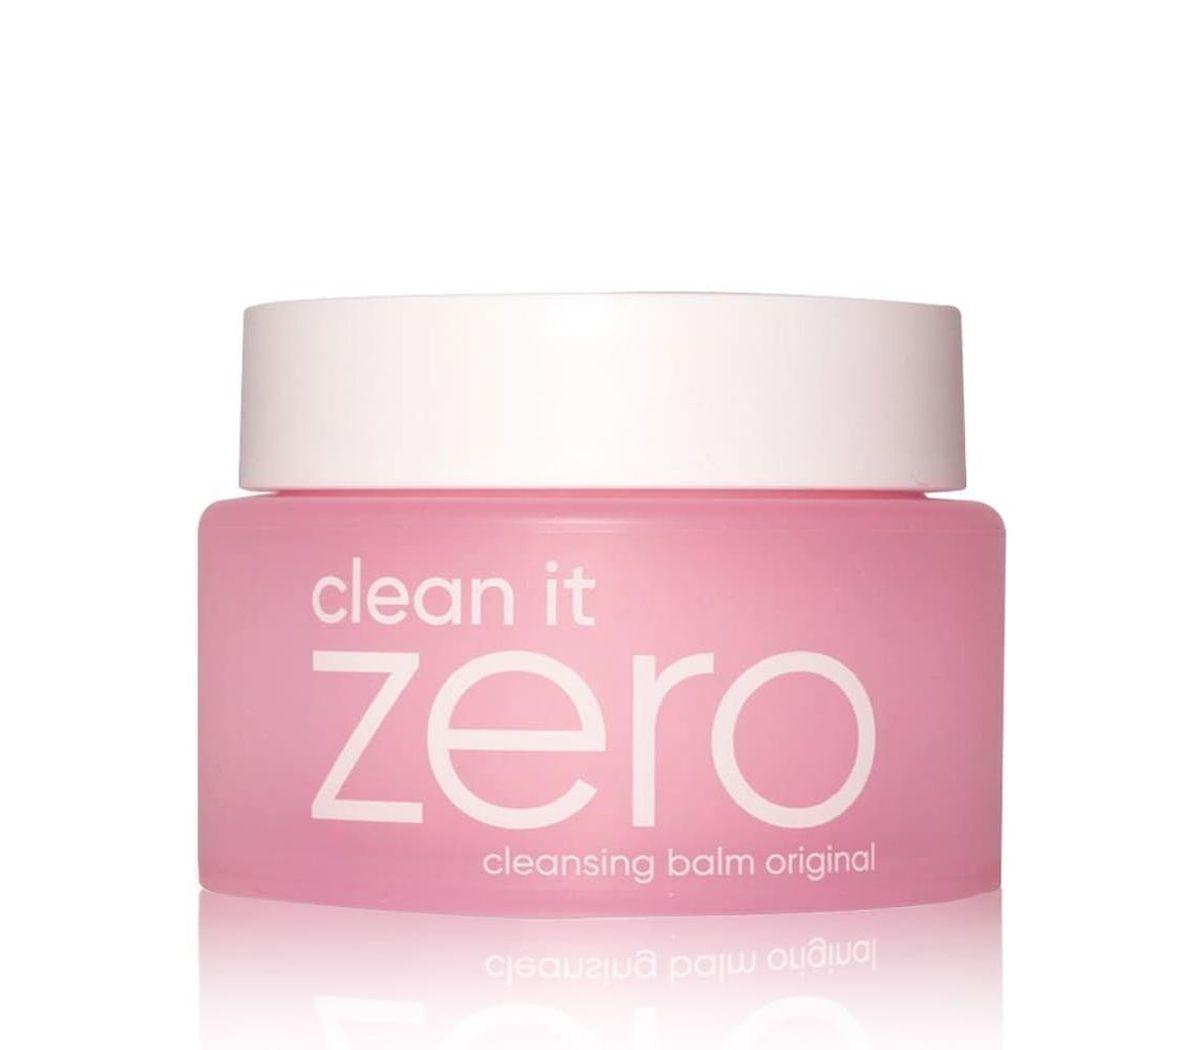 Очищающий бальзам-щербет для снятия макияжа BANILA CO Clean It Zero Cleansing Balm Original - 100 мл